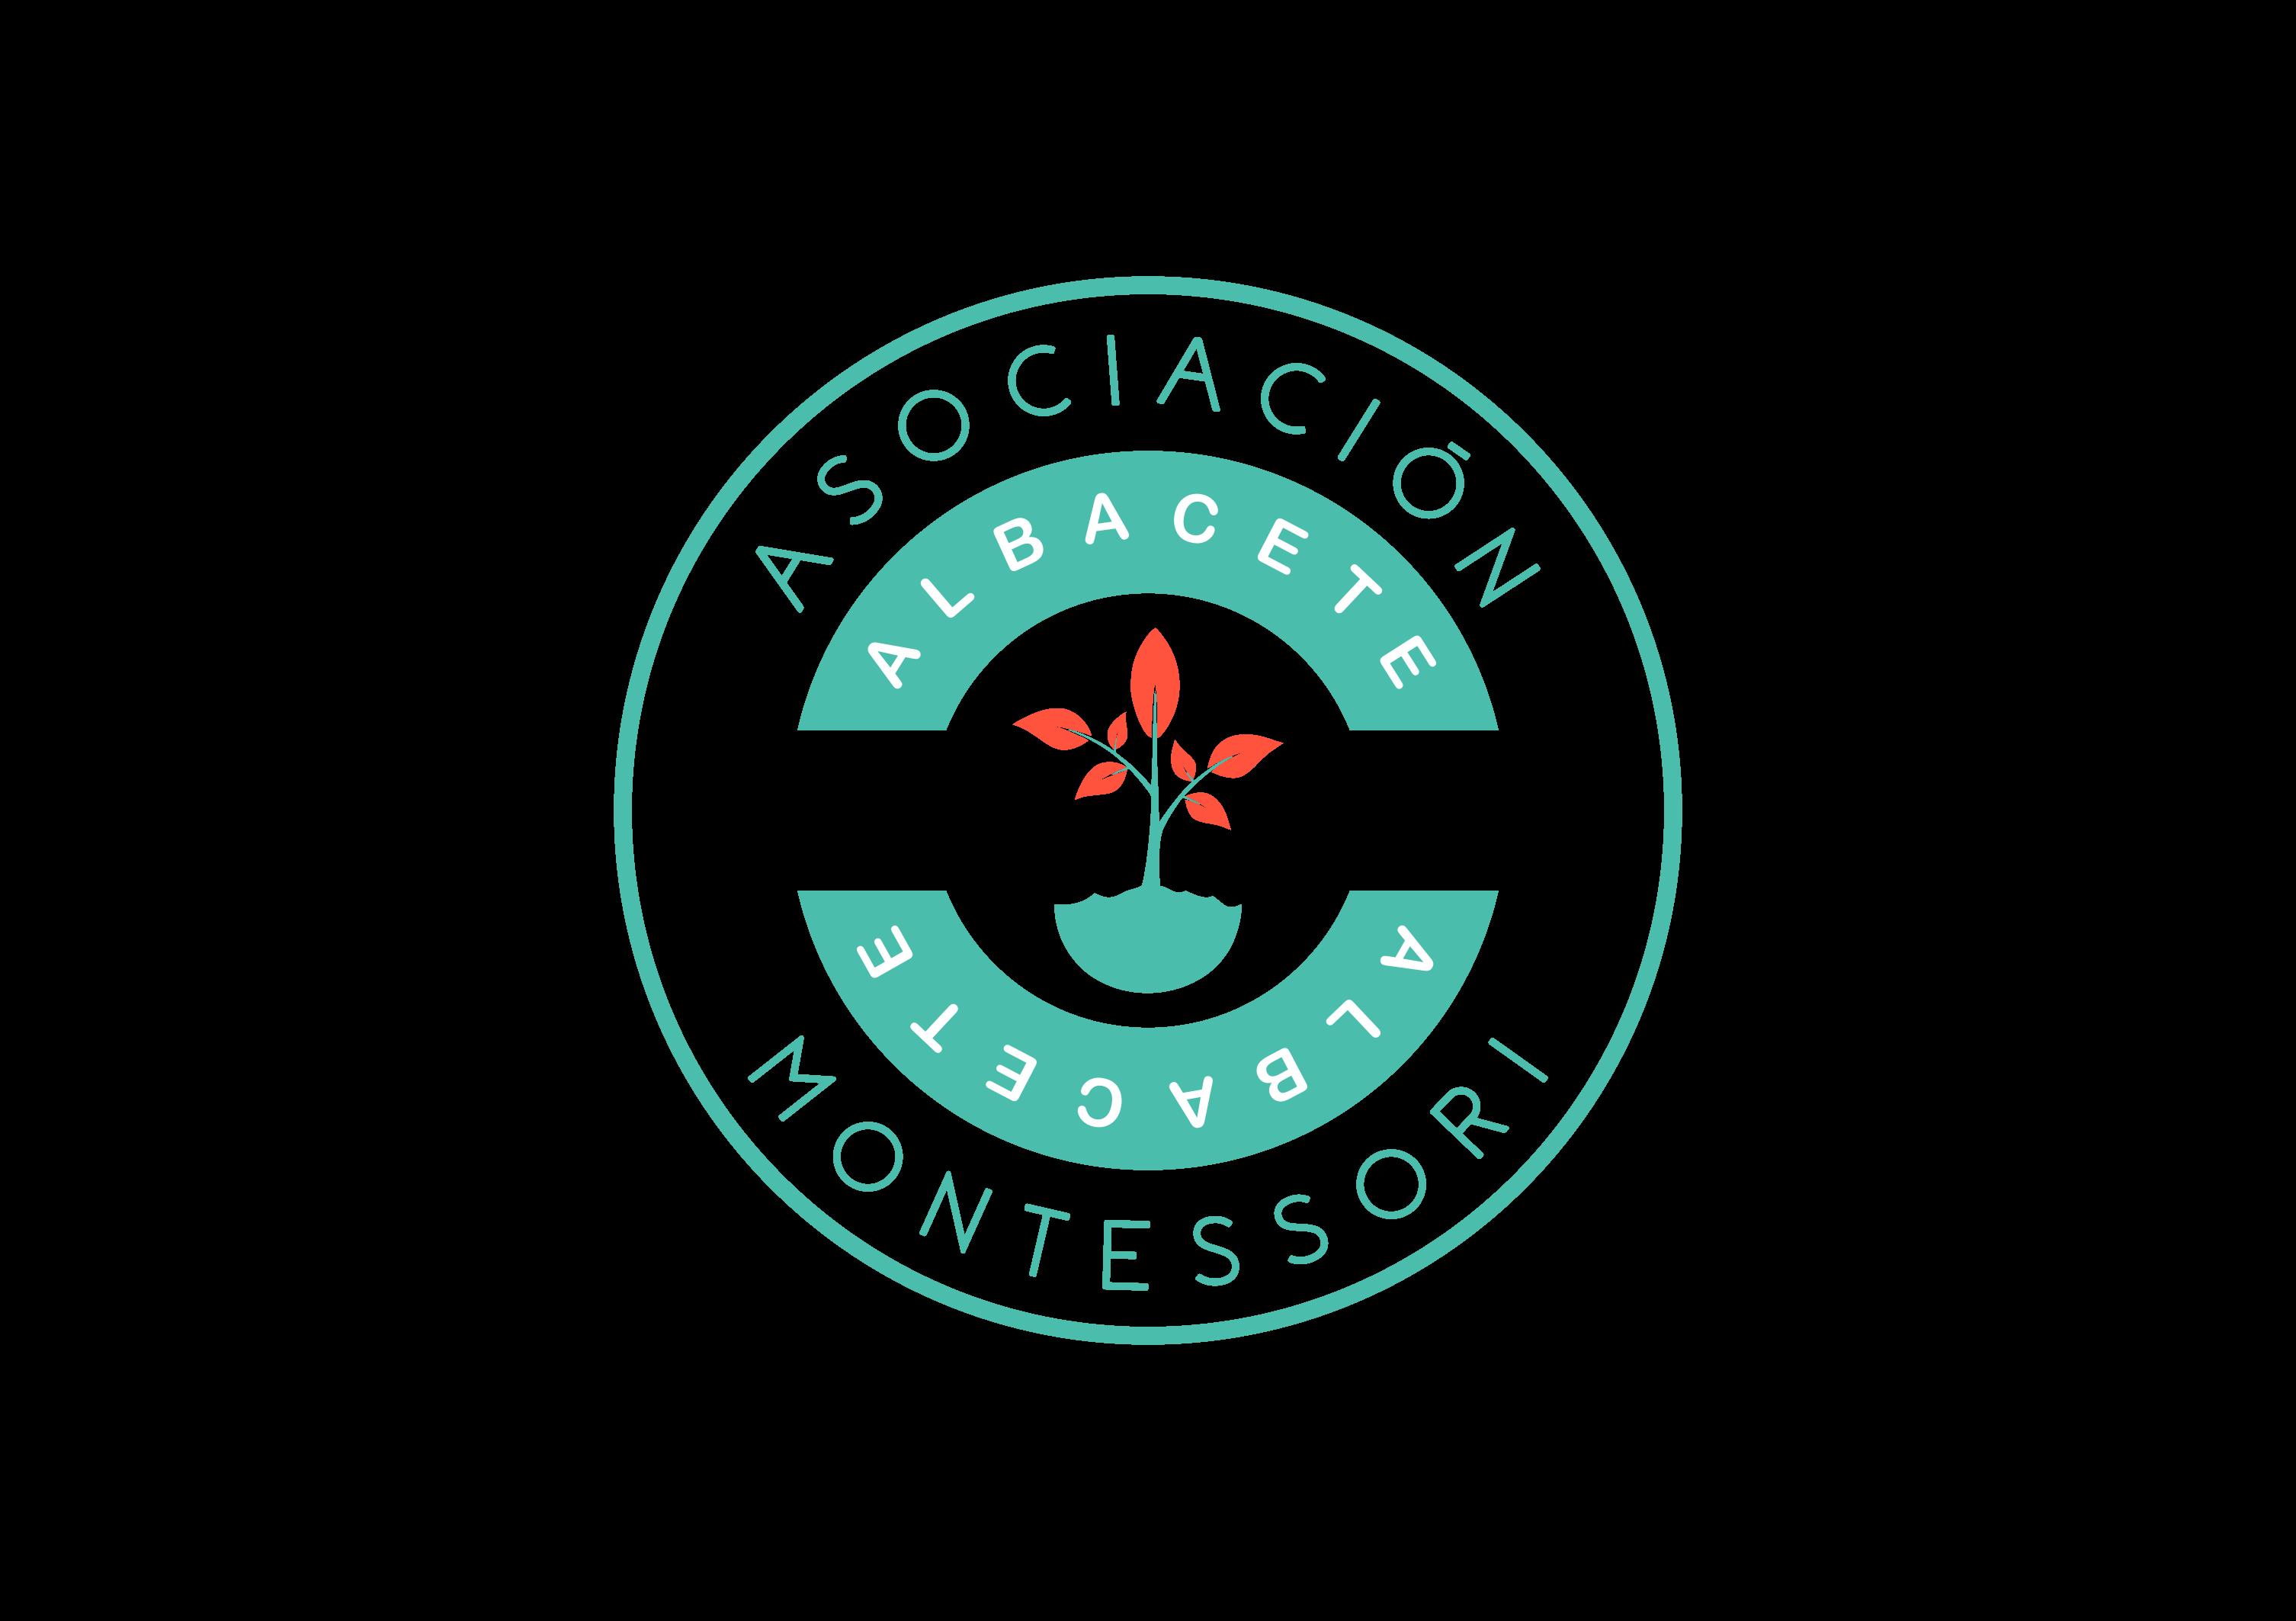 Asociación Montessori de Albacete